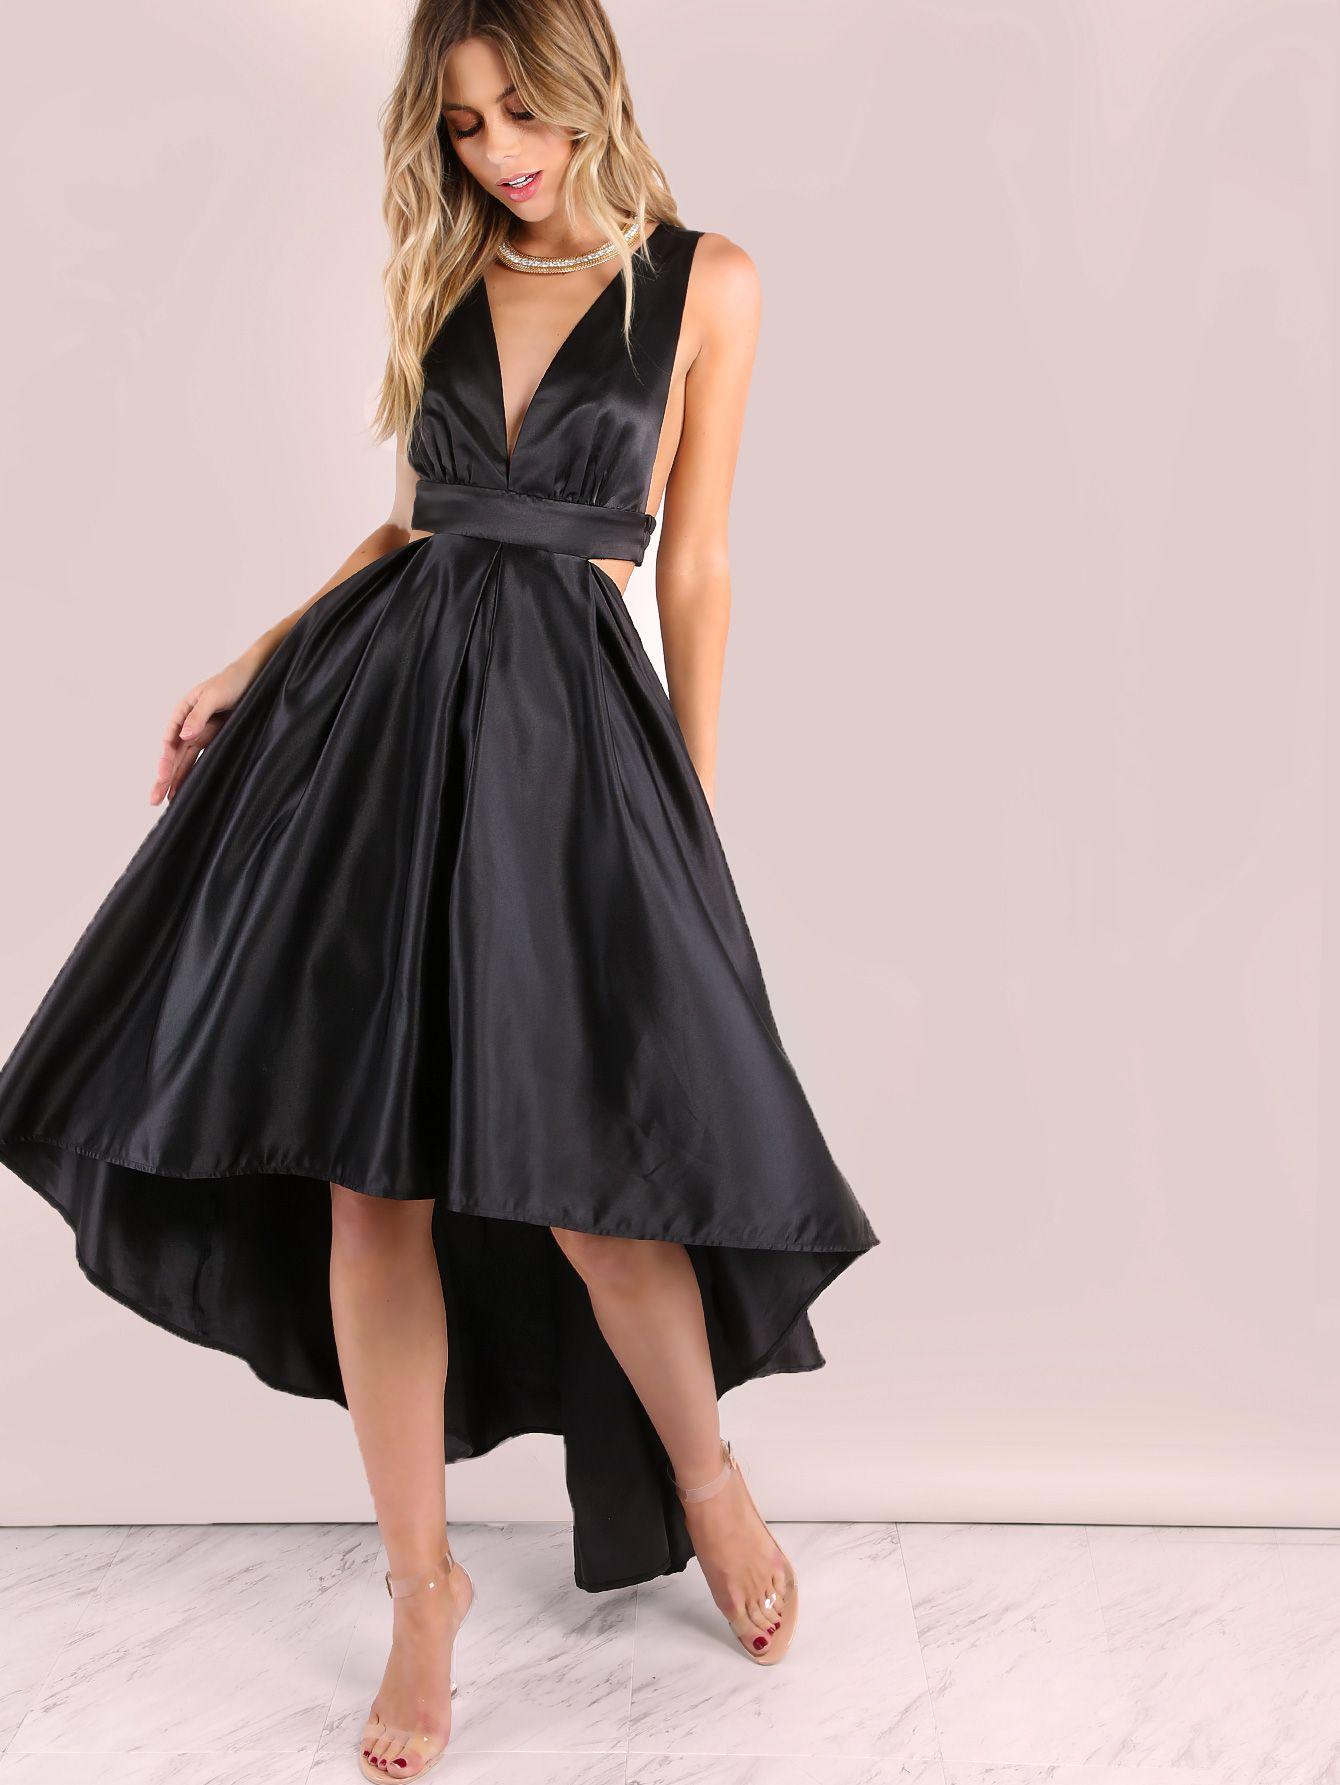 Shop black deep v neck cut out high low dress online shein offers